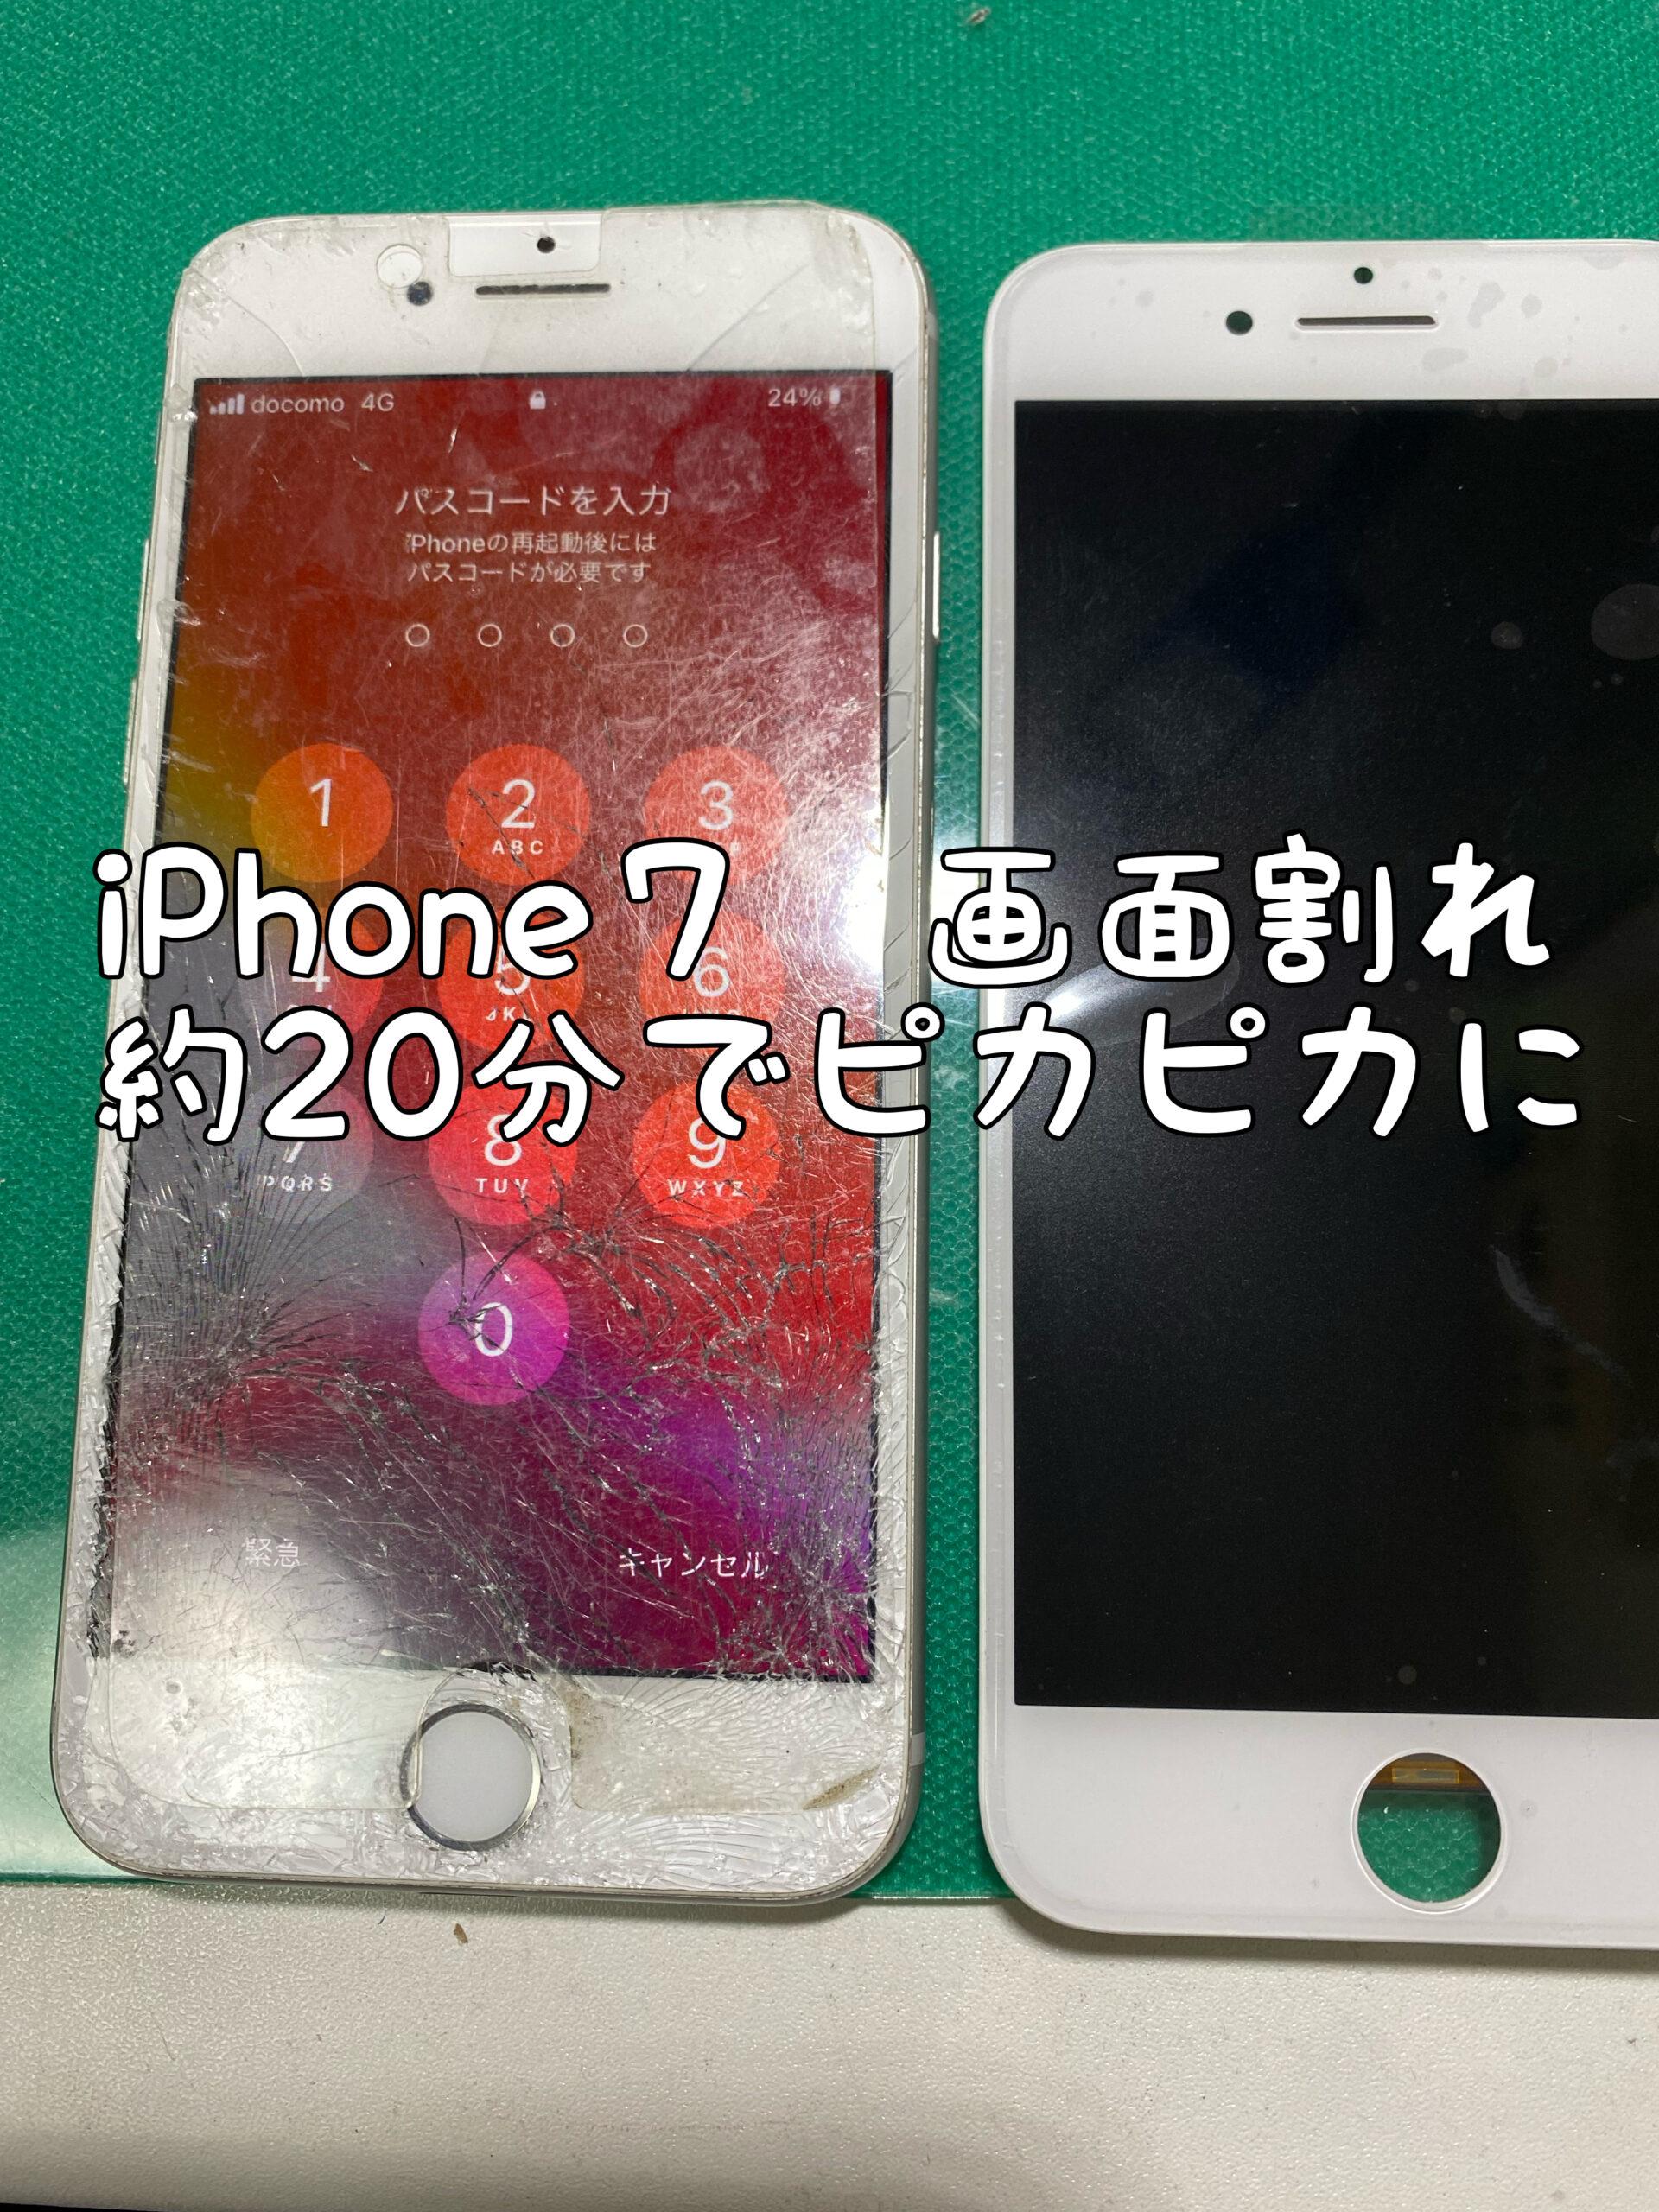 iPhone修理 アイフォン修理 扶桑町 大口町 ドンキ 安い 即日 バッテリー交換